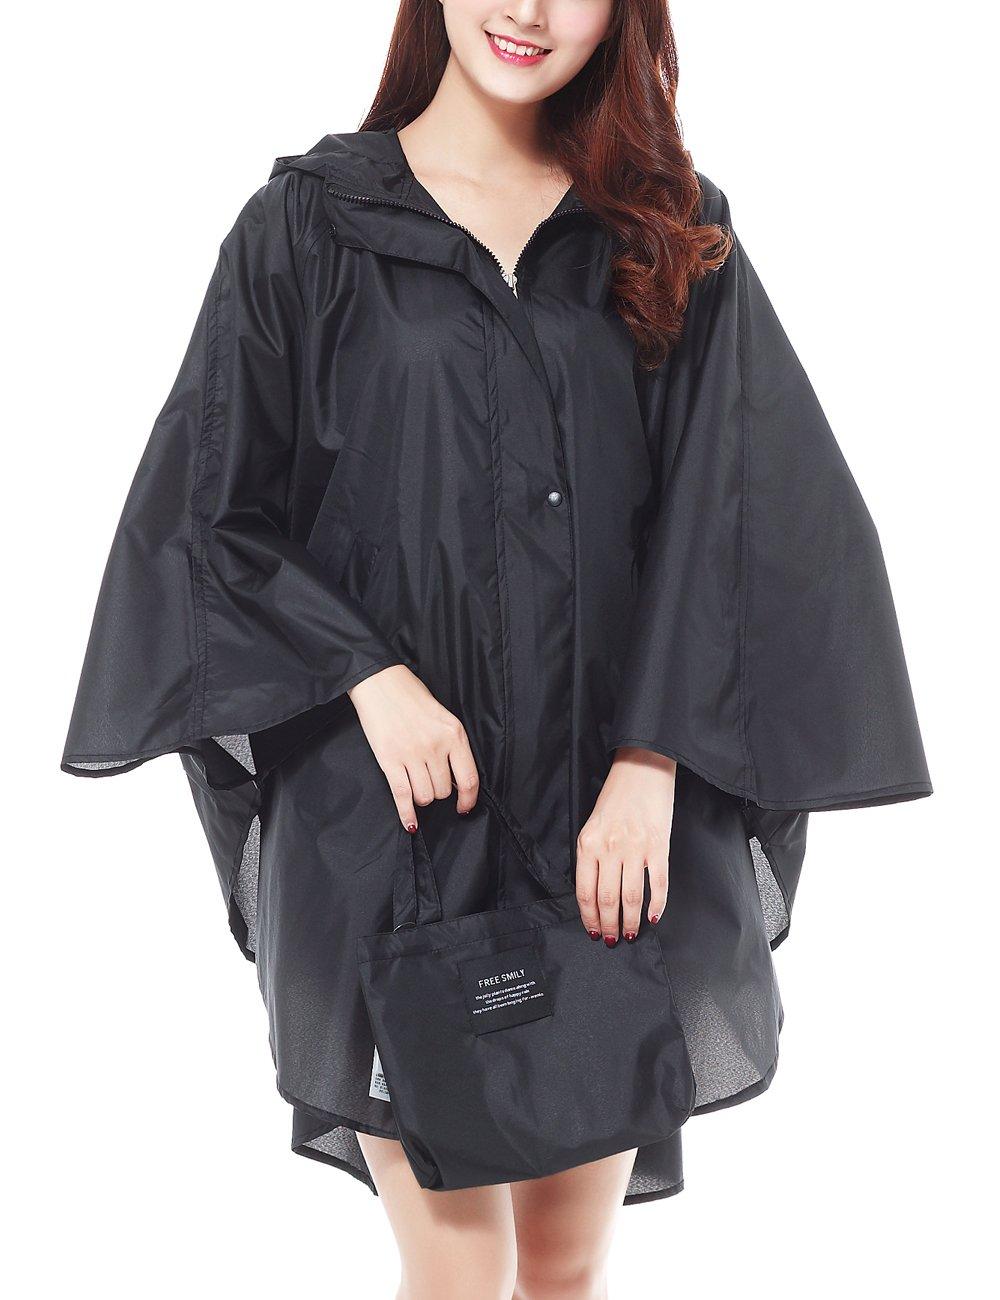 LOHASCASA OUTERWEAR ガールズ B07BGSHNGS One Size|ブラック ブラック One Size